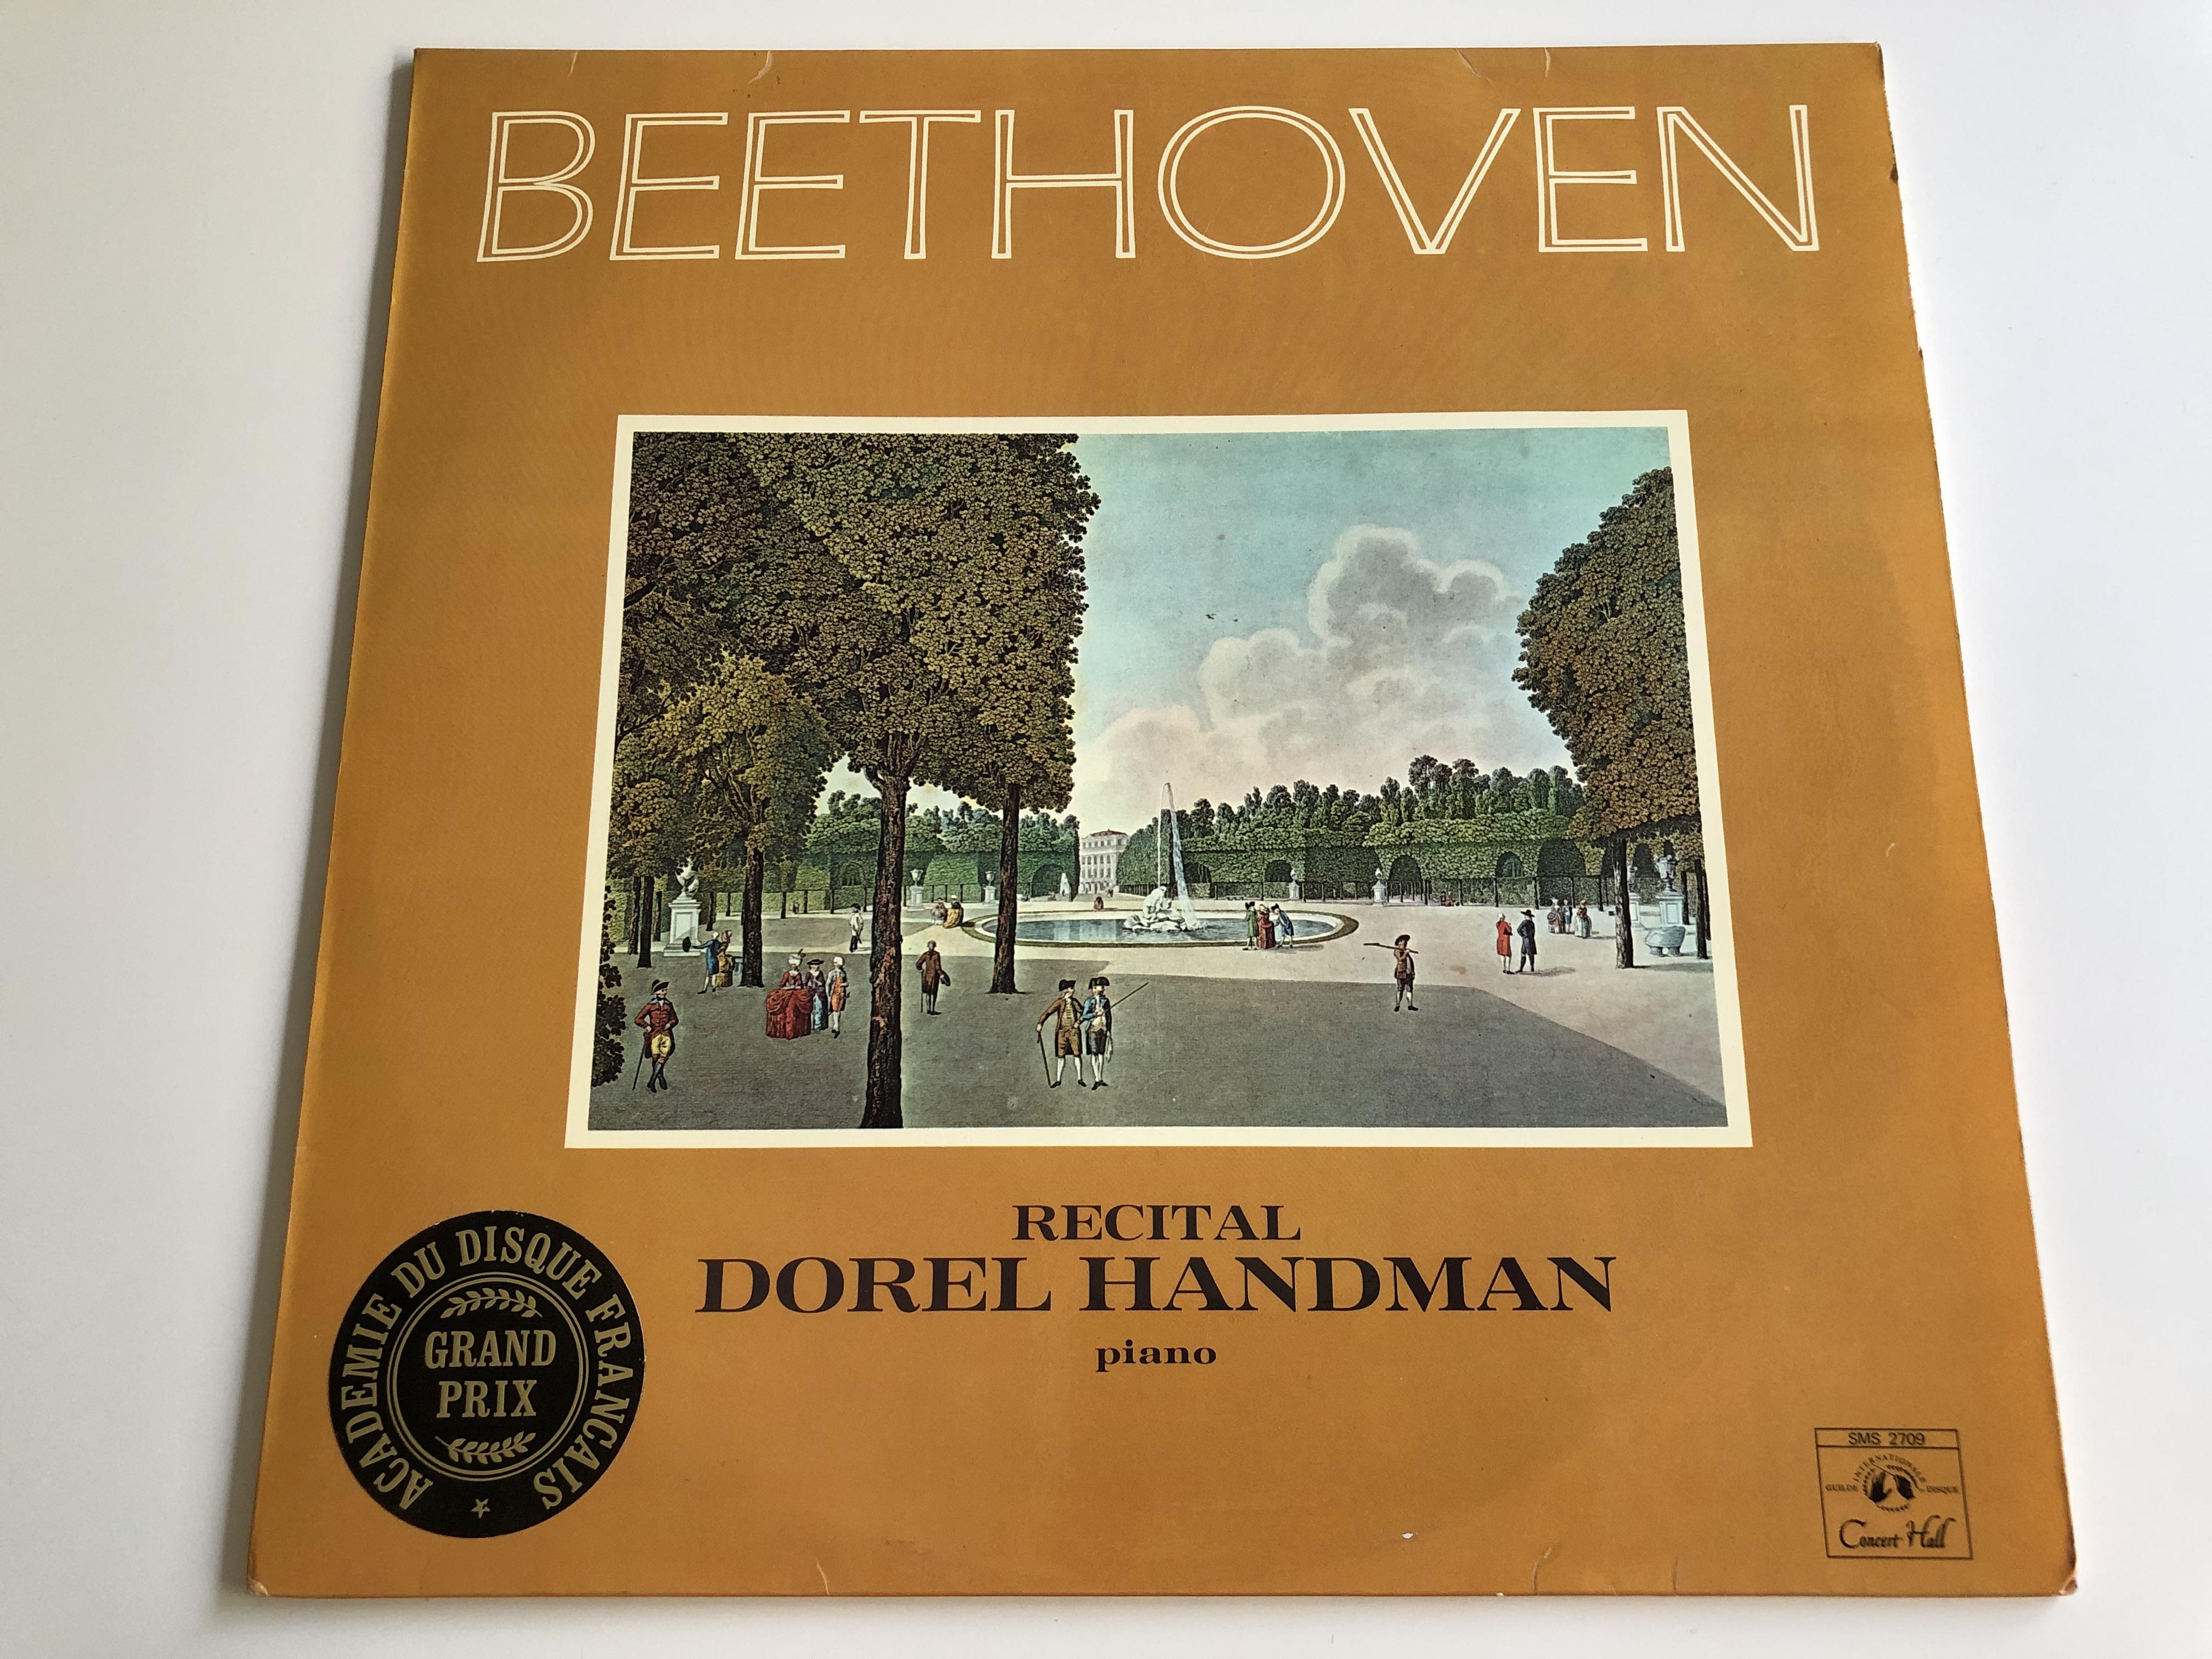 beethoven-recital-dorel-handman-piano-gravure-universelle-synchro-stereo-sms-2709-1-.jpg